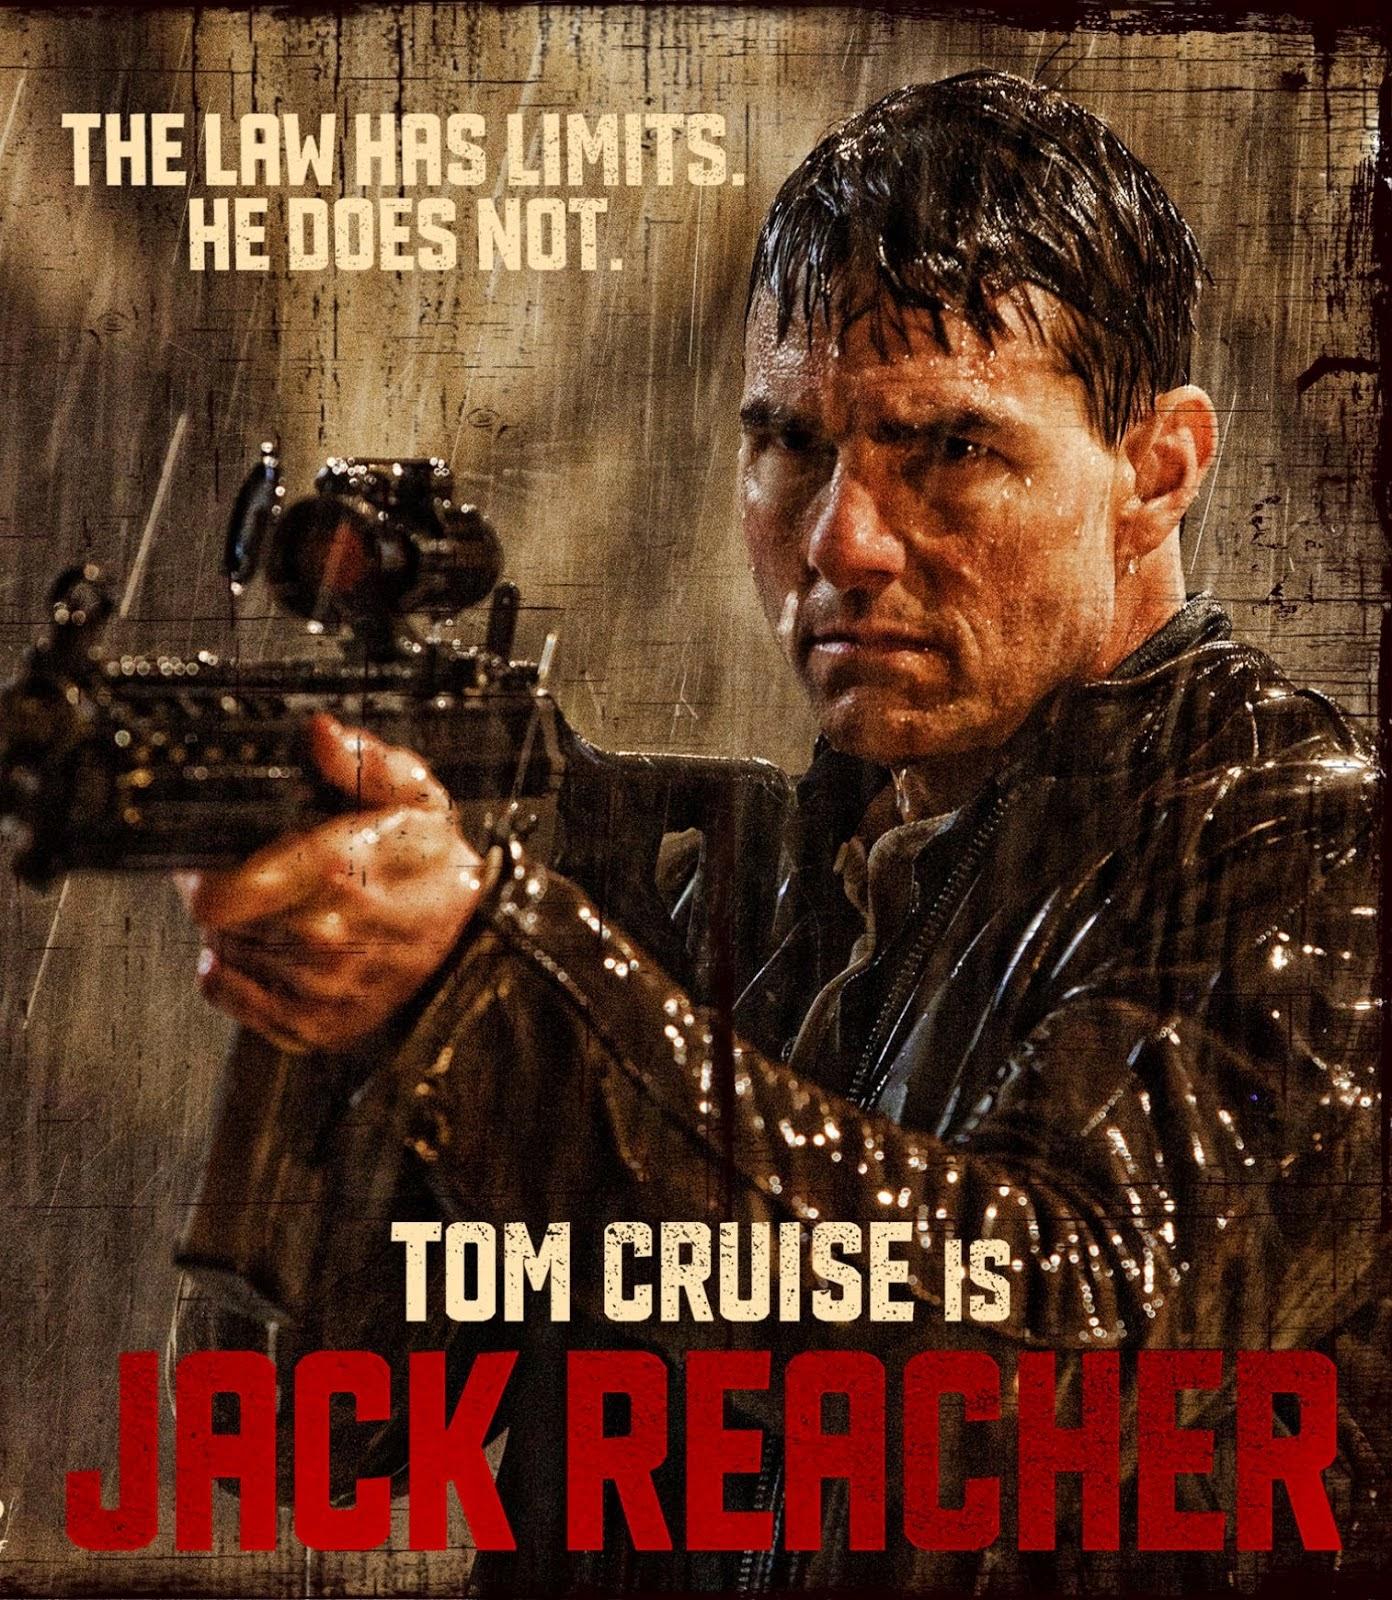 Jack Reacher แจ็ค รีชเชอร์ ยอดคนสืบระห่ำ [HD][พากย์ไทย]